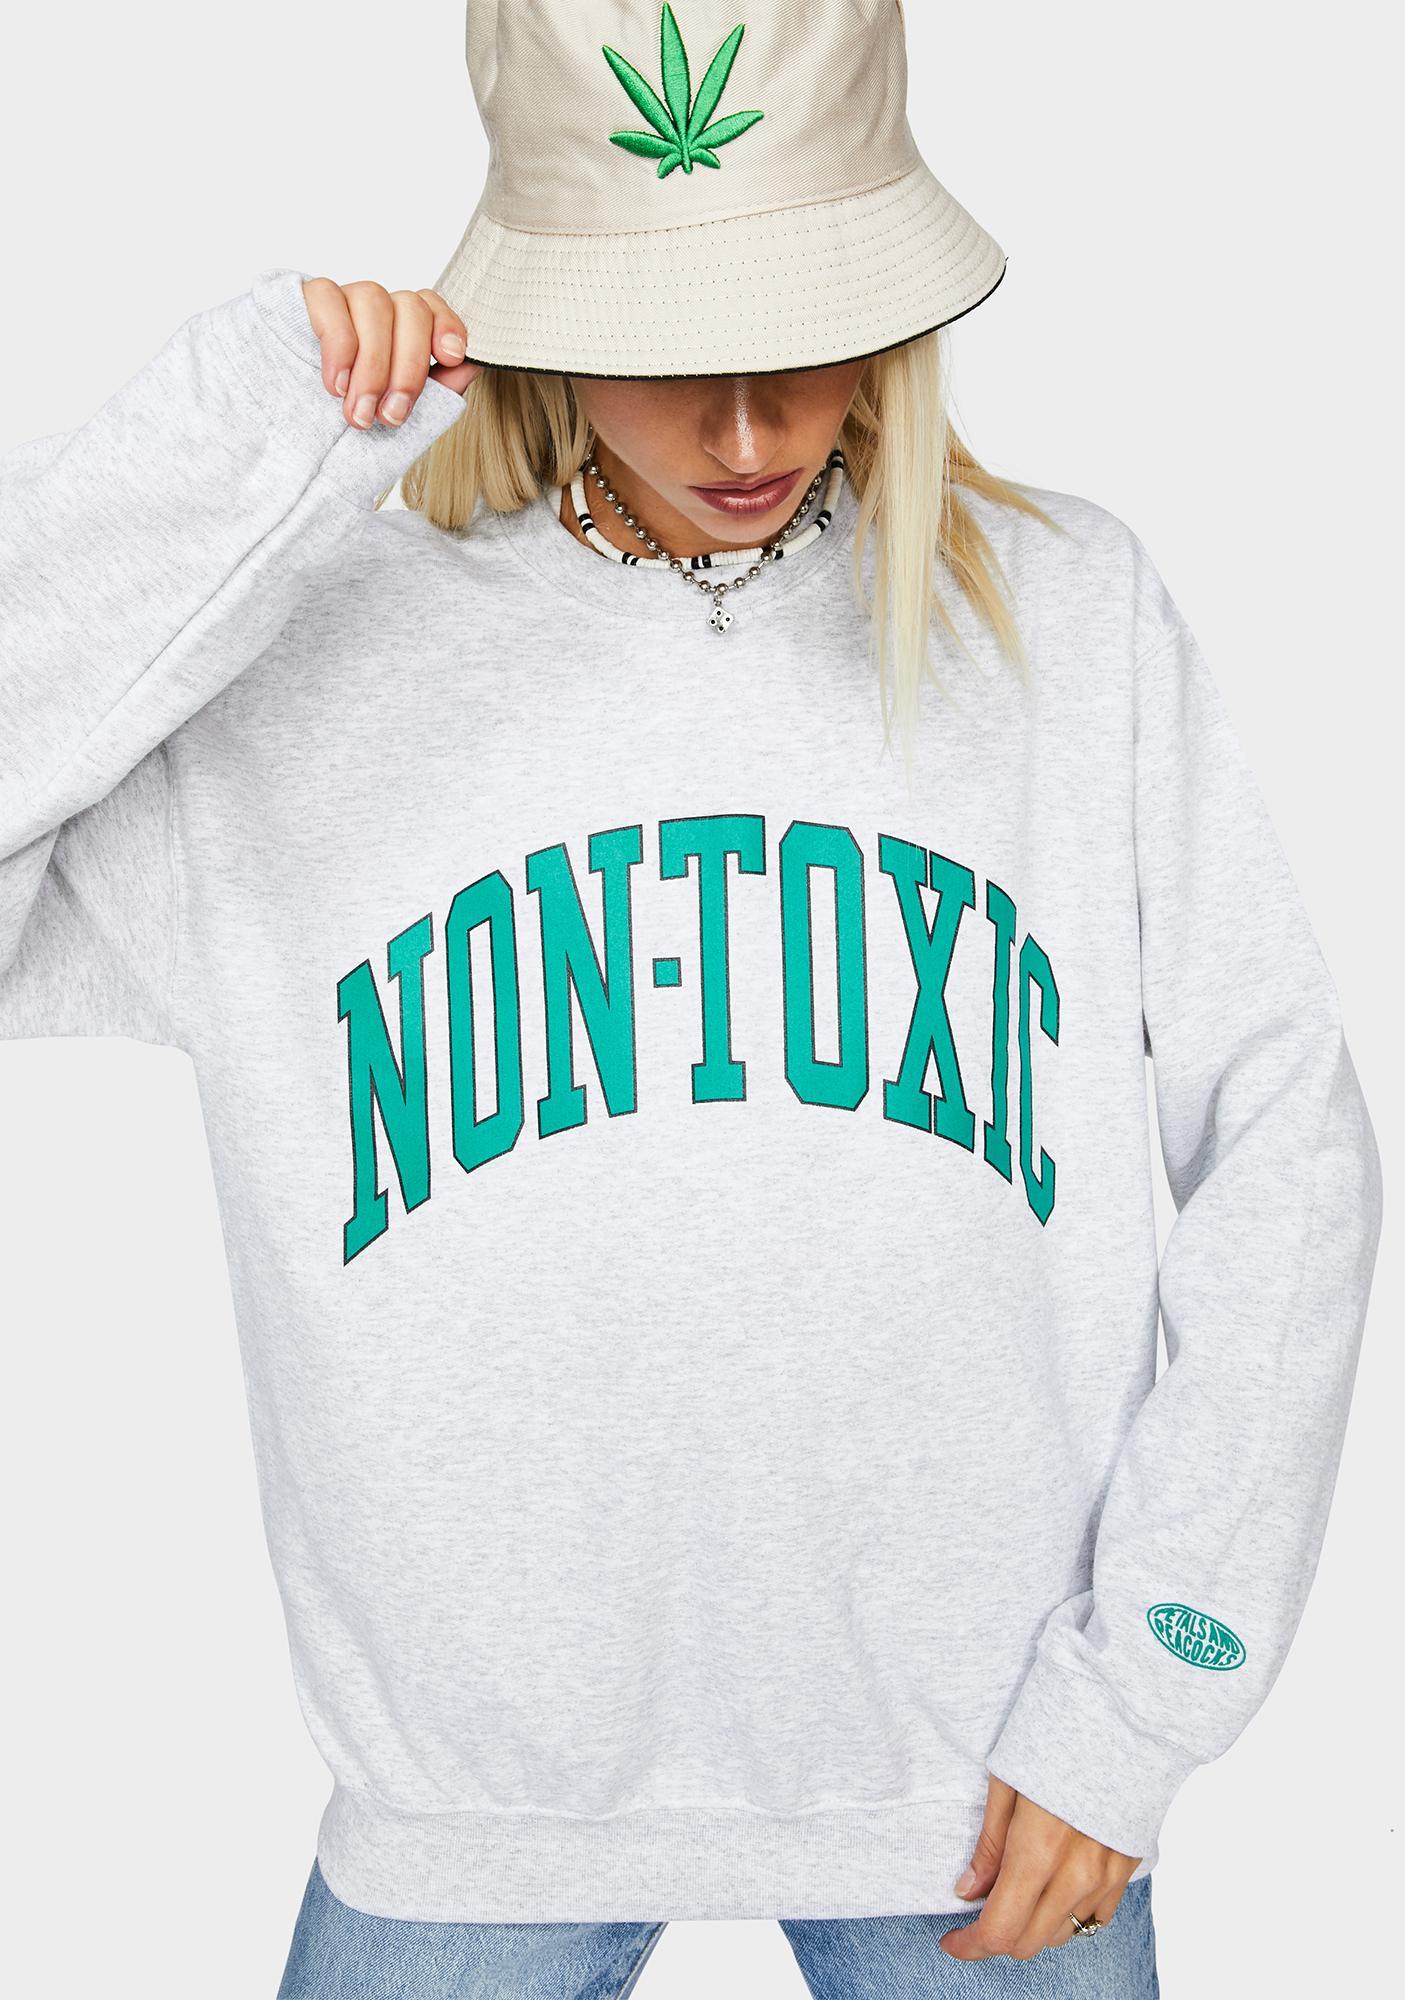 Petals and Peacocks Non Toxic Graphic Sweatshirt